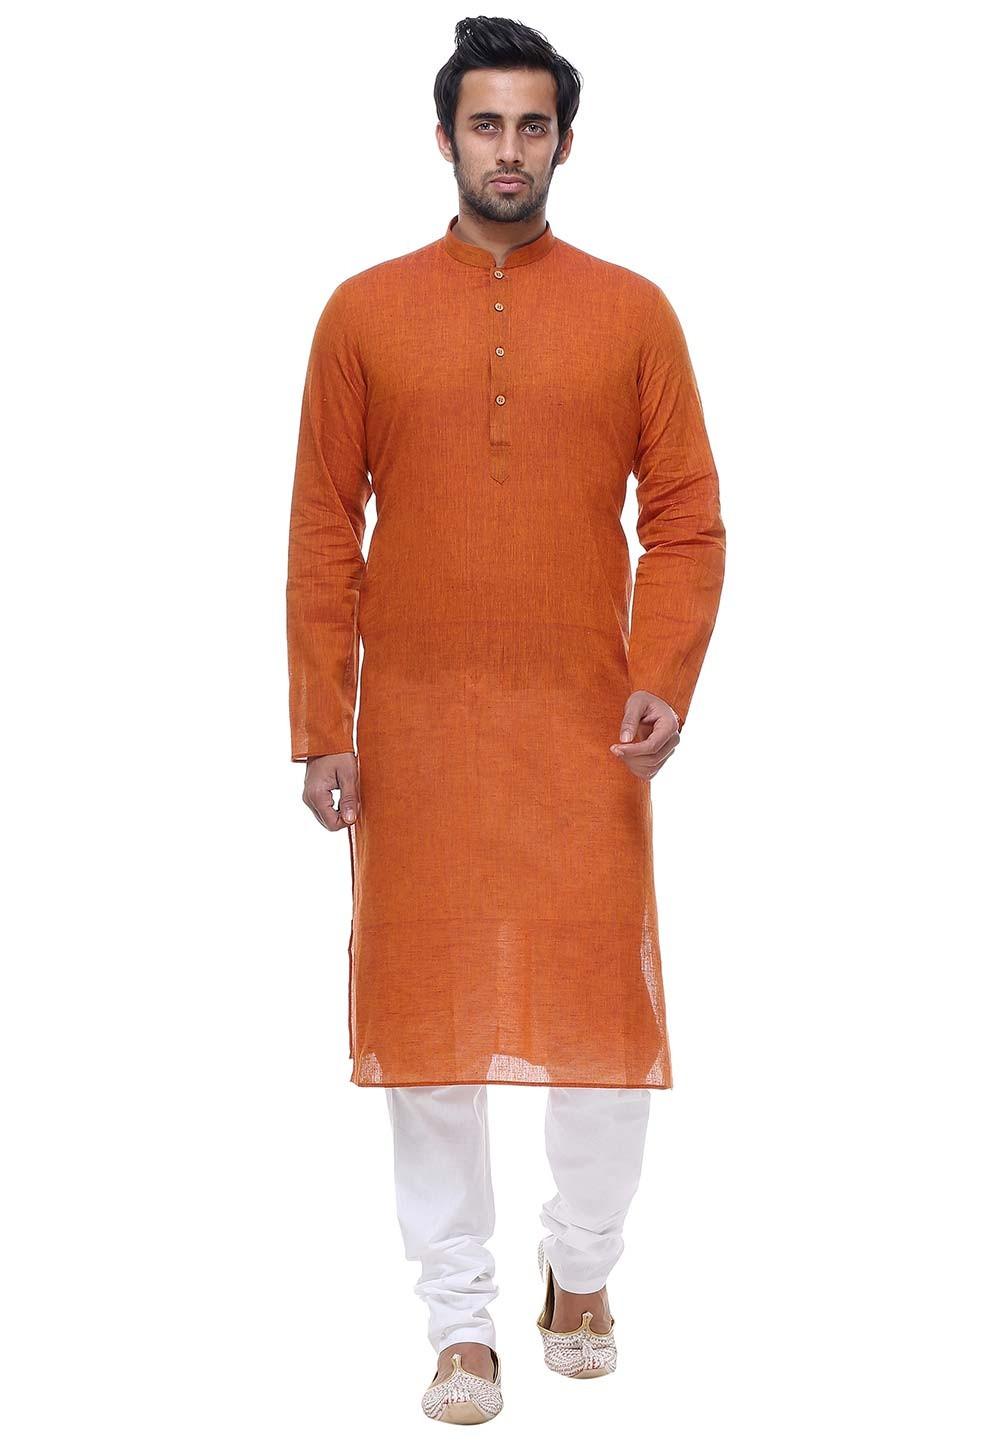 Orange Color Cotton Kurta Pajama.